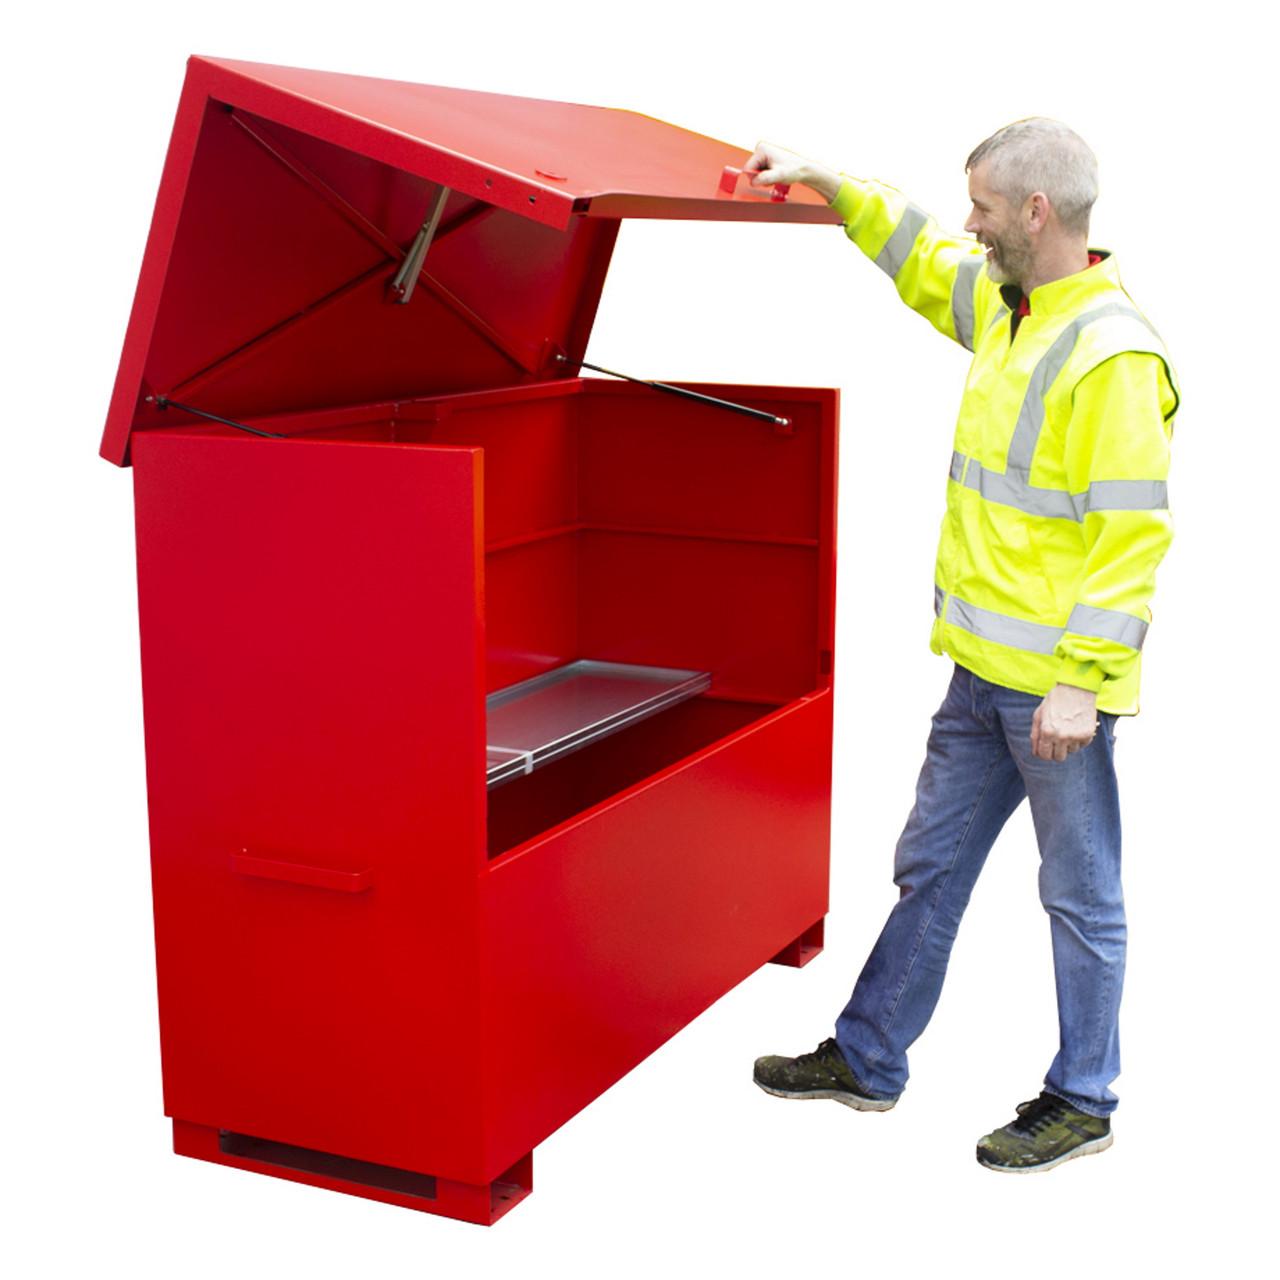 CS9 Chemstor Storage Box 1585mm x 675mm x 1278mm